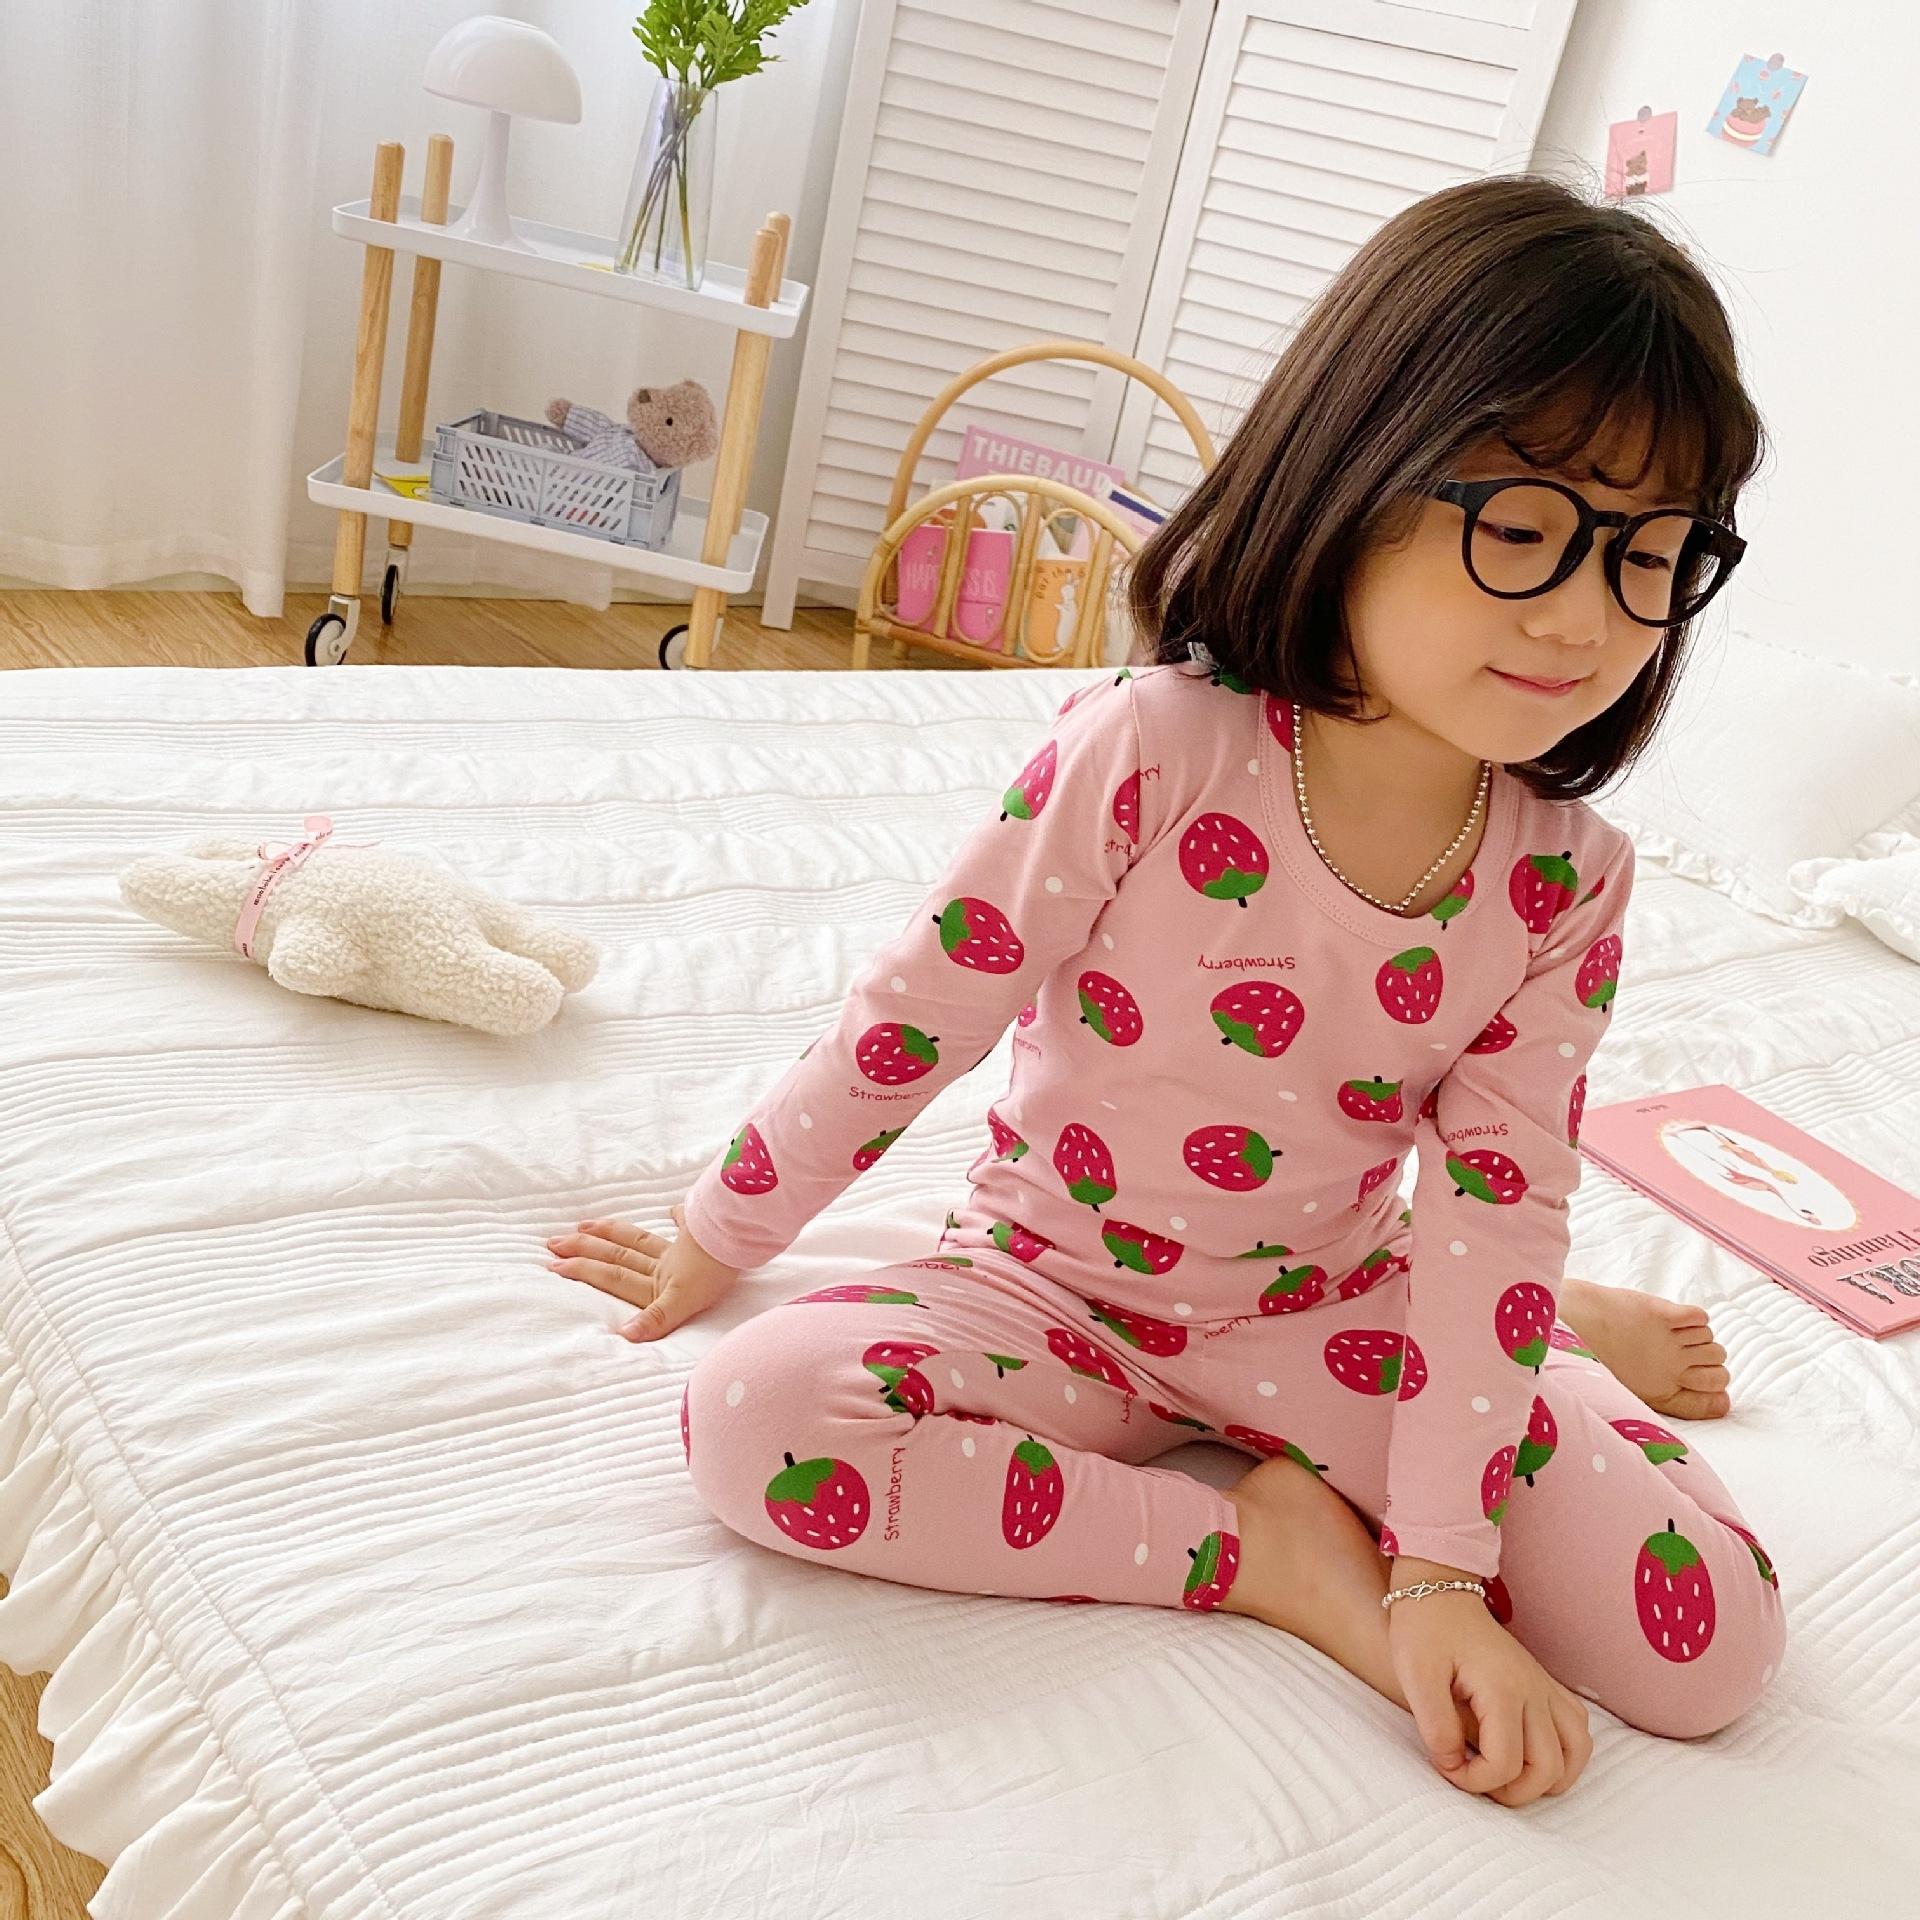 854o bebé cómodo pijamas niños039; s bata franela bebé baño largo capucha churn bata bata de baño dibujos animados niños niños niñas noche manga